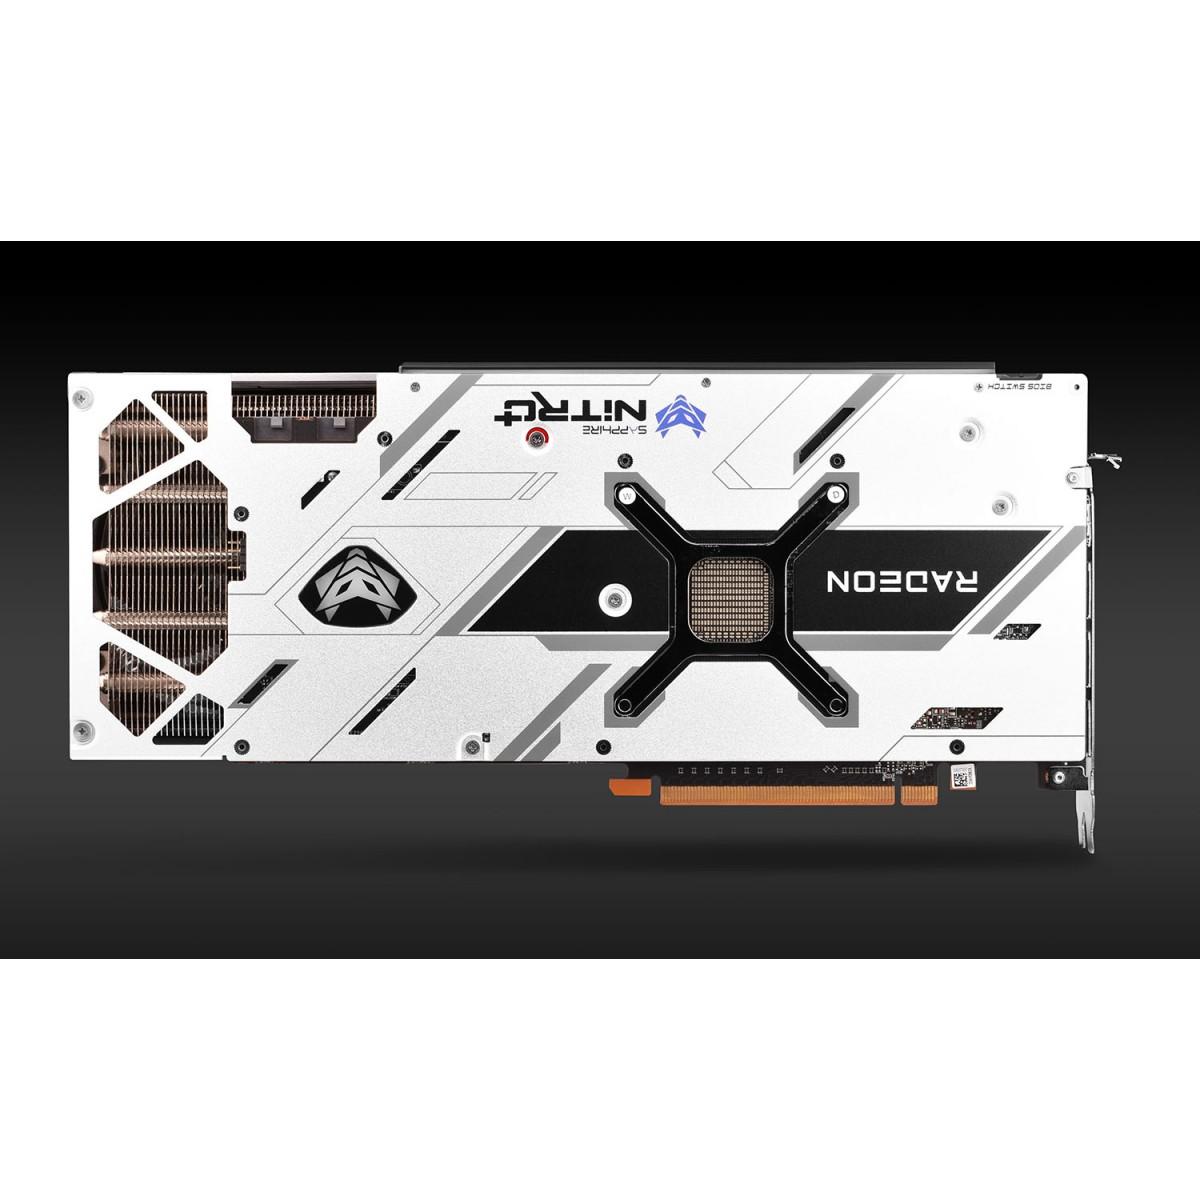 Placa de Vídeo Sapphire Radeon Nitro+ AMD Radeon RX 6800, 16GB, GDDR6, 256bit, 11305-01-20G